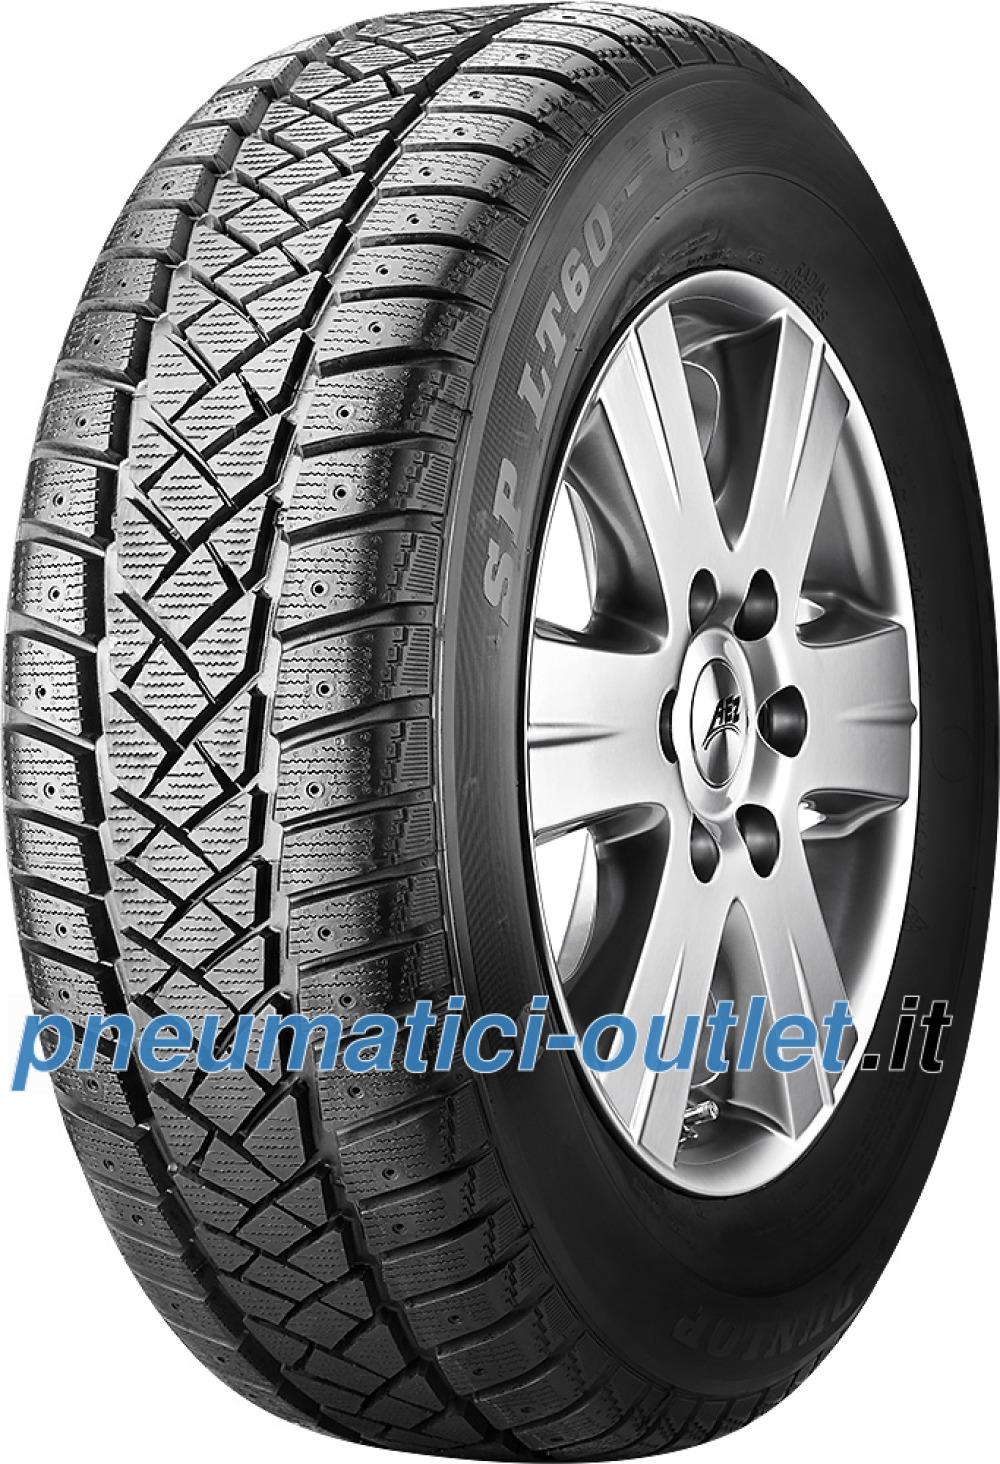 Dunlop SP LT 60 ( 235/65 R16C 115/113R 8PR )